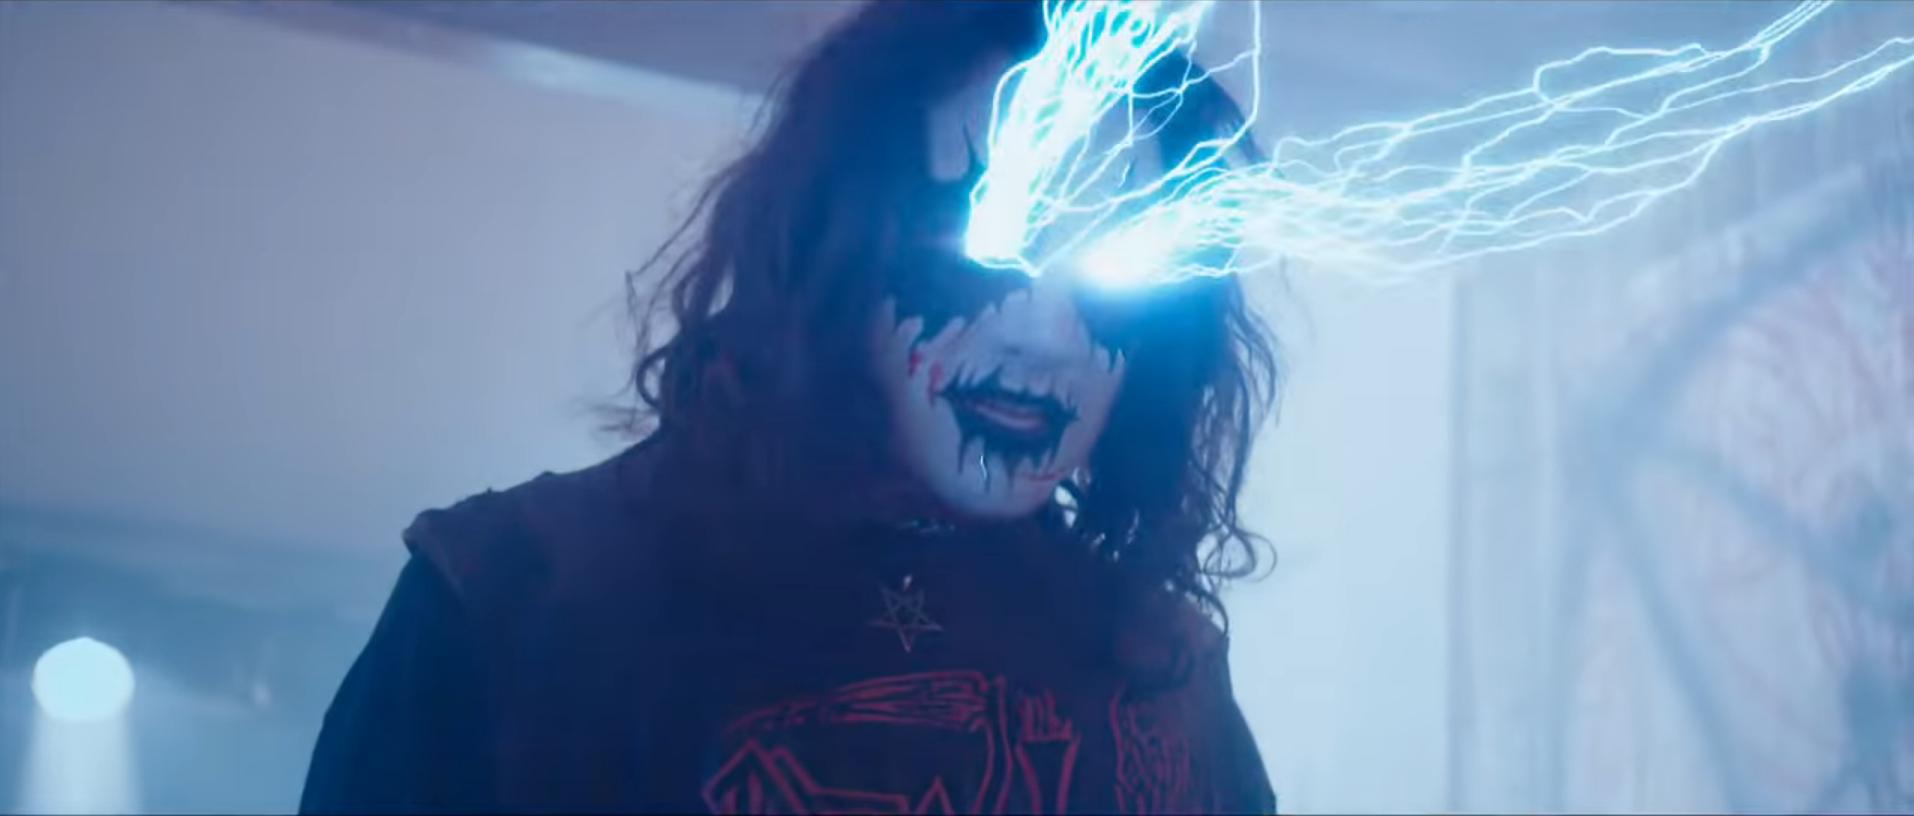 Deathgasm Top 10 Demonic Movies